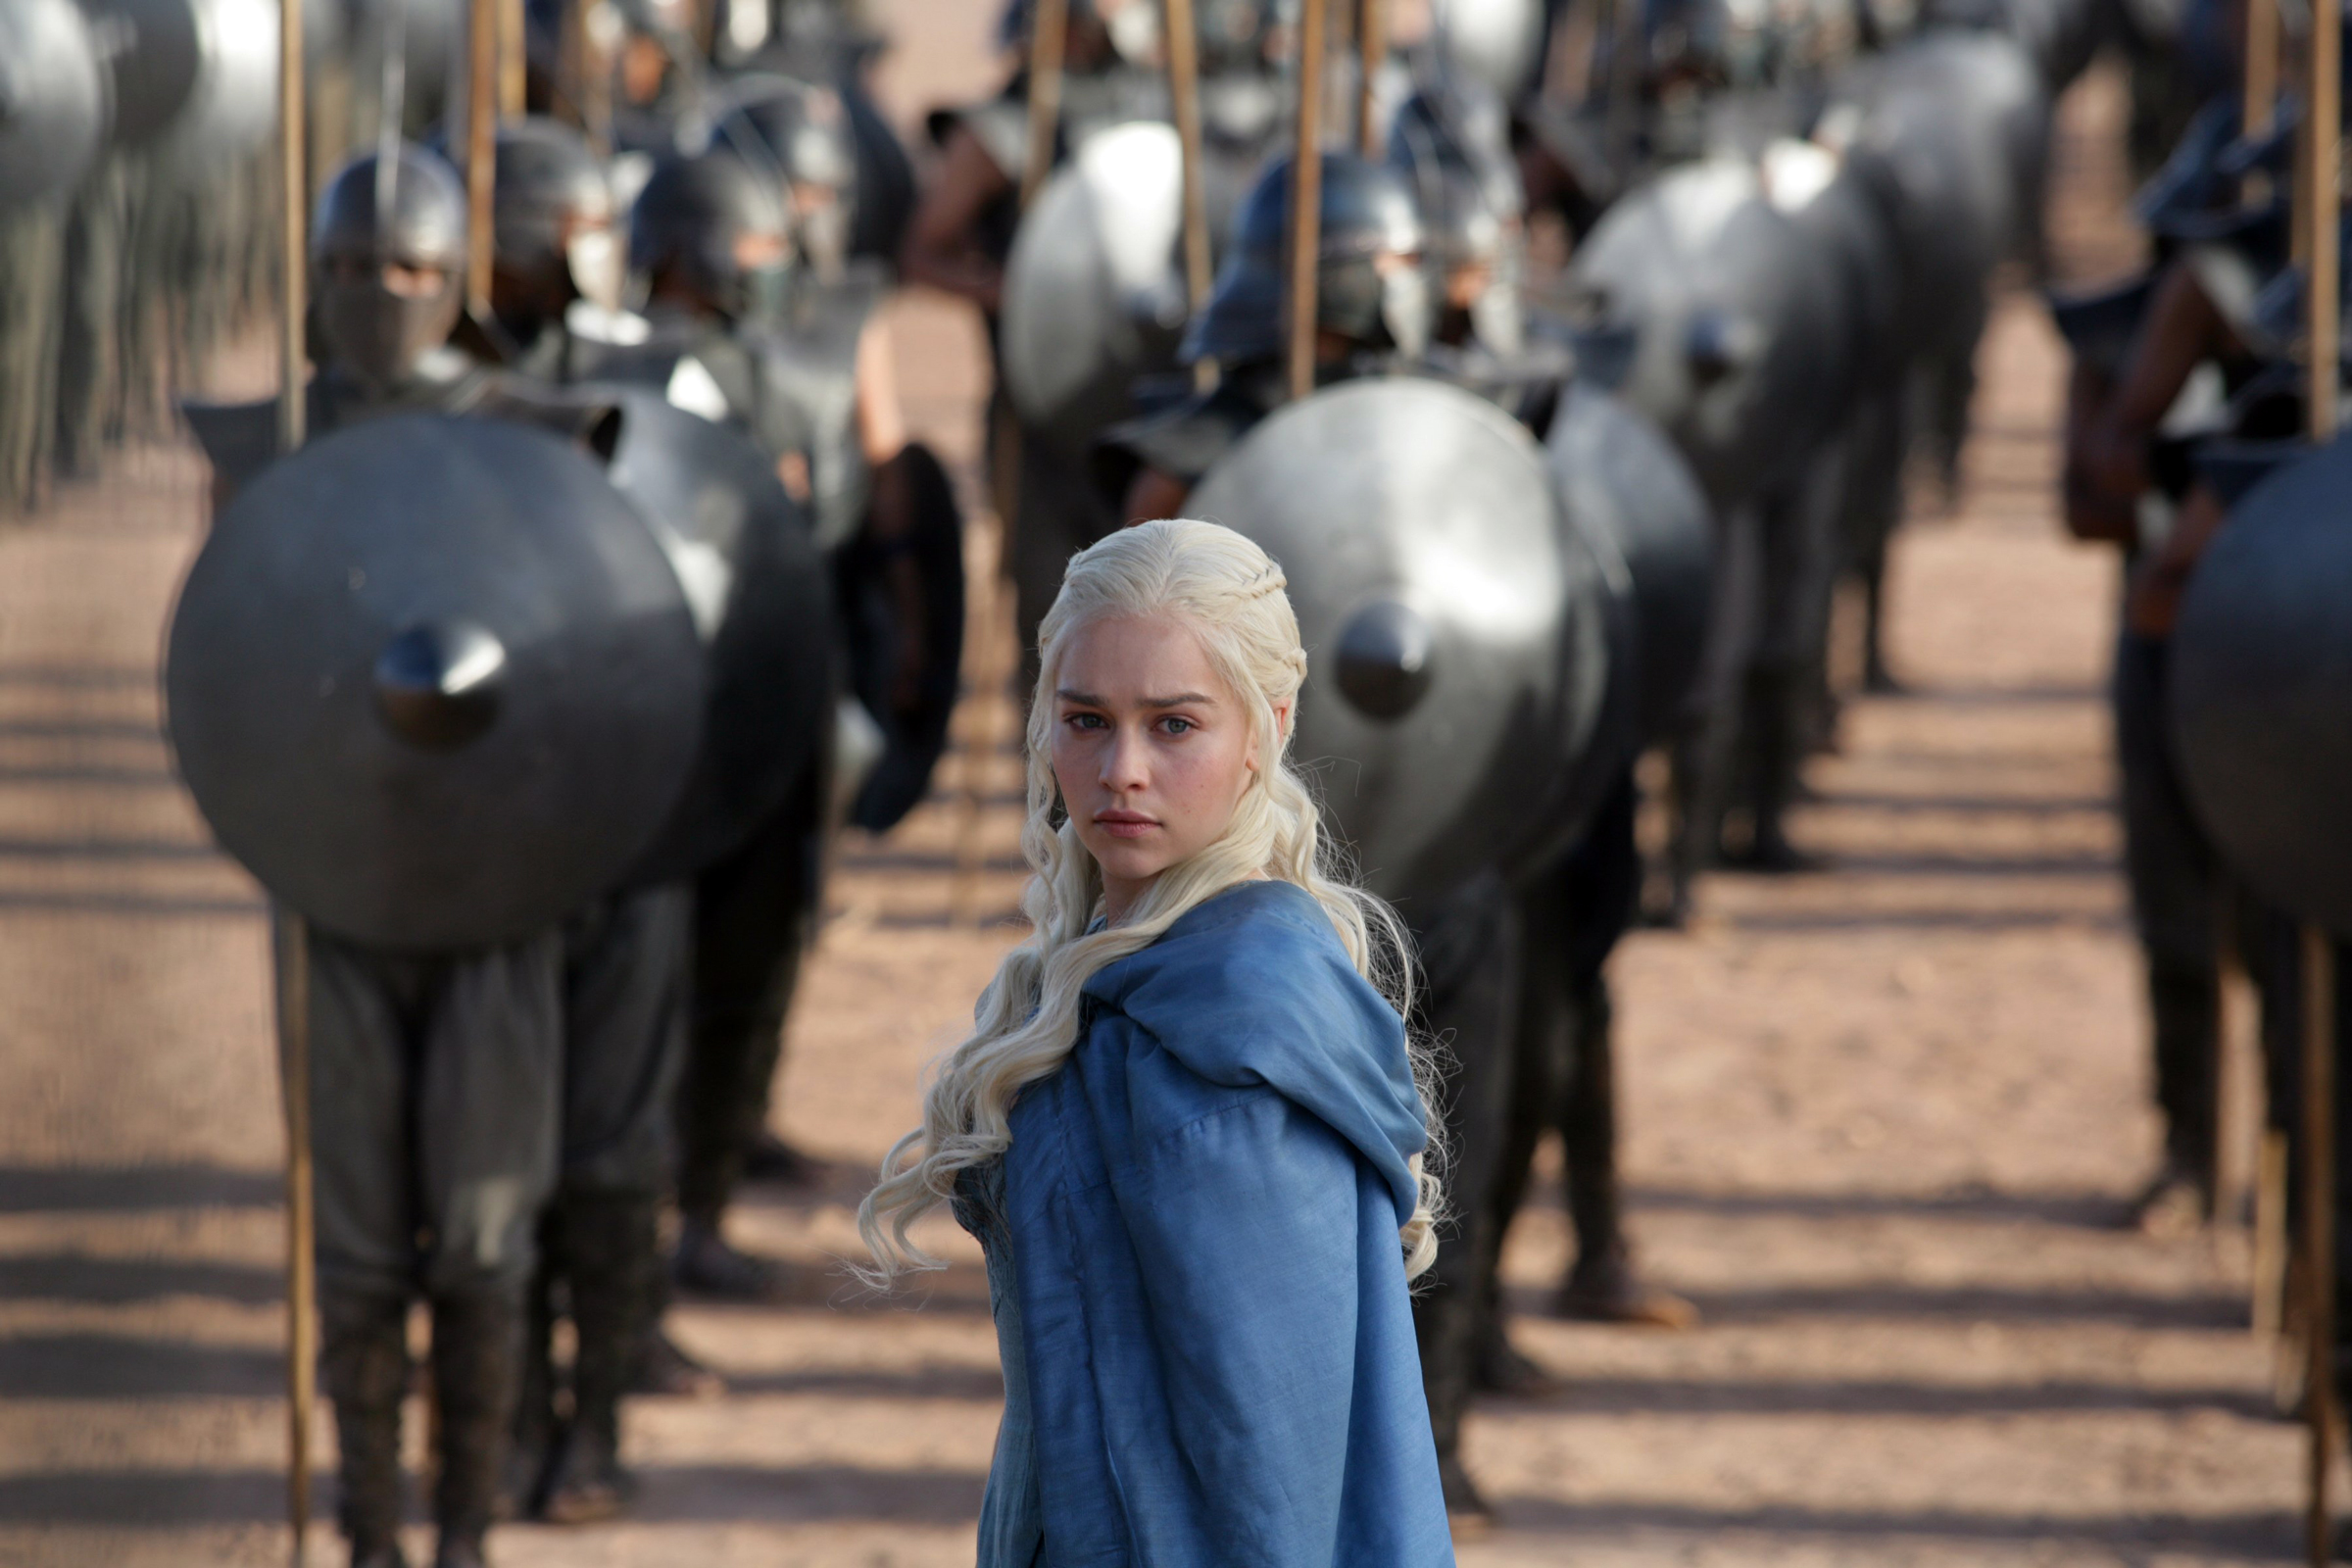 Elizabeth Warren Is Rooting for Daenerys Targaryen in 'Game of Thrones'